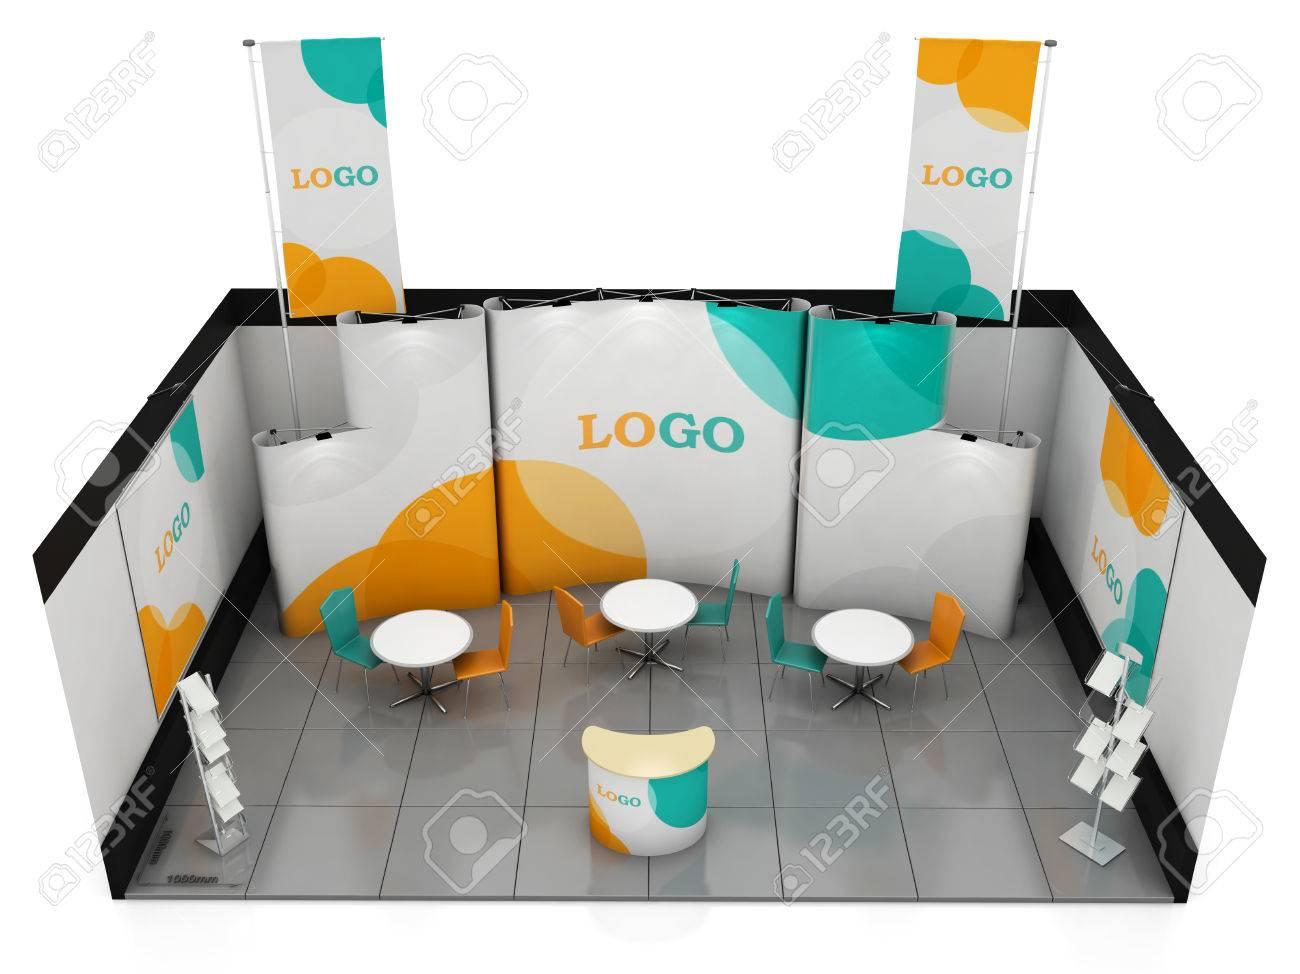 Creative Exhibition Stand Design : Blank creative exhibition stand design with color shapes booth